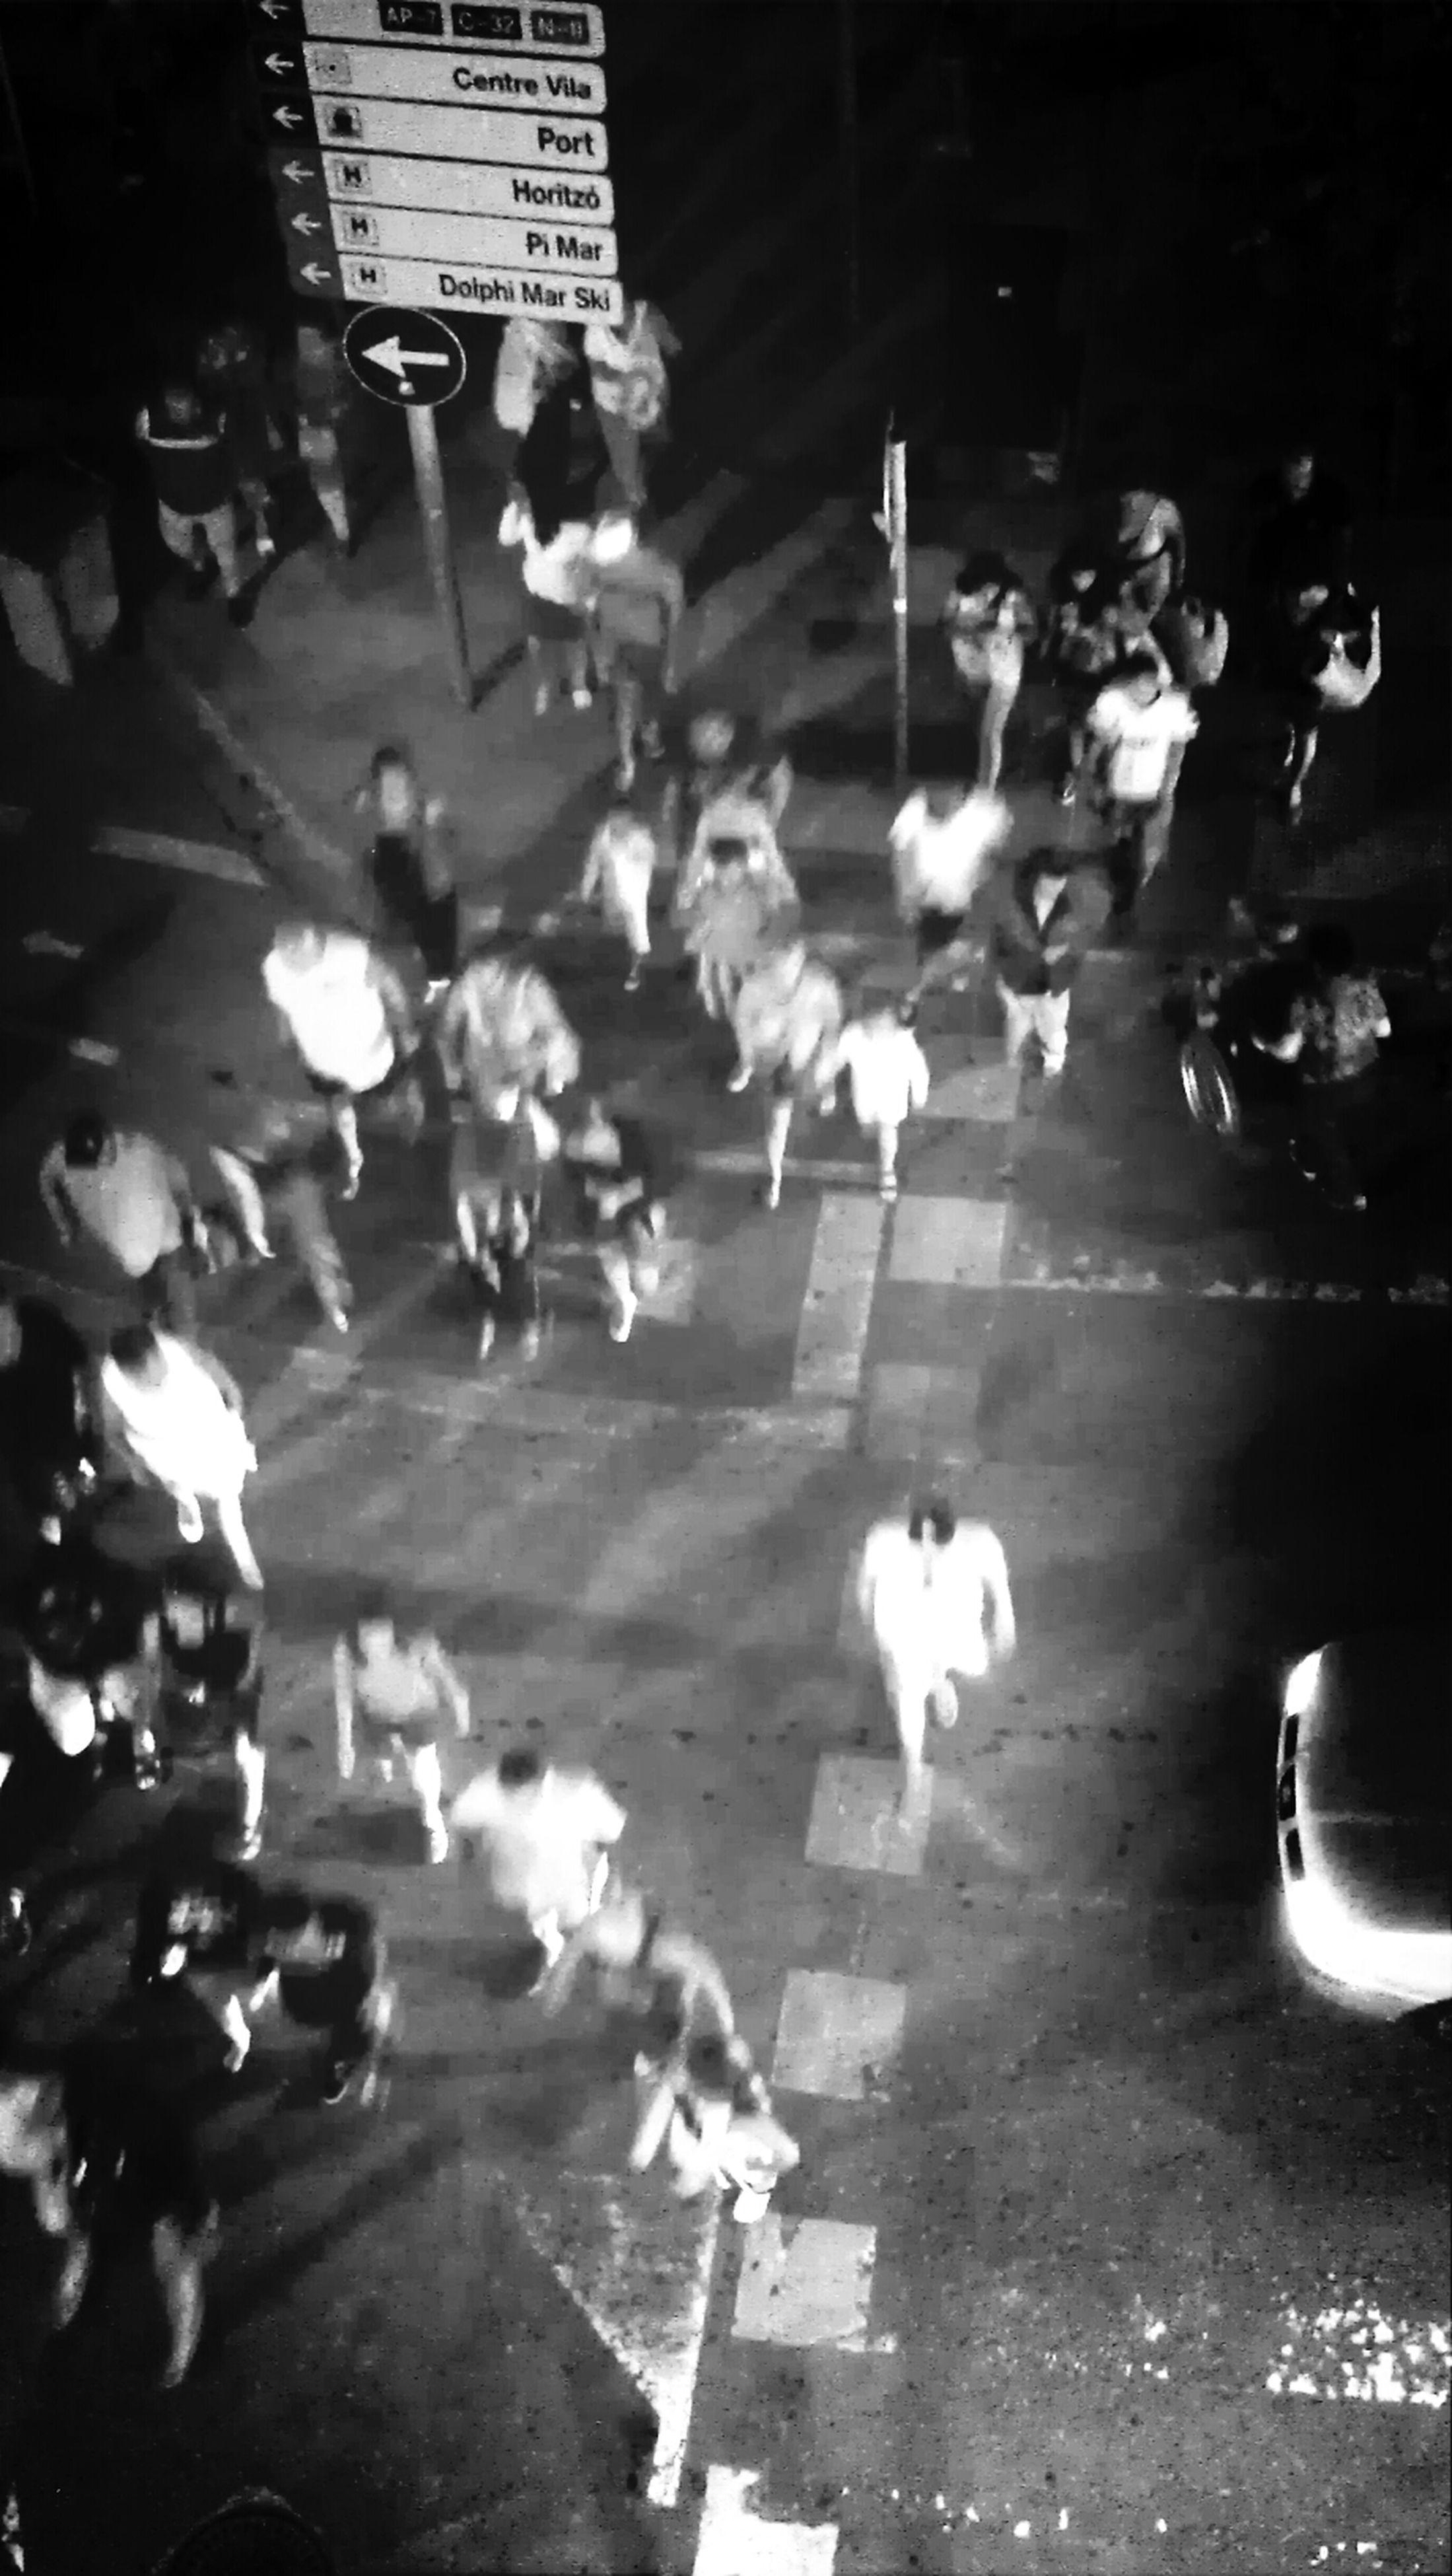 animal themes, street, domestic animals, pets, high angle view, dog, road, night, mammal, outdoors, one animal, walking, sunlight, shadow, city, incidental people, car, sidewalk, illuminated